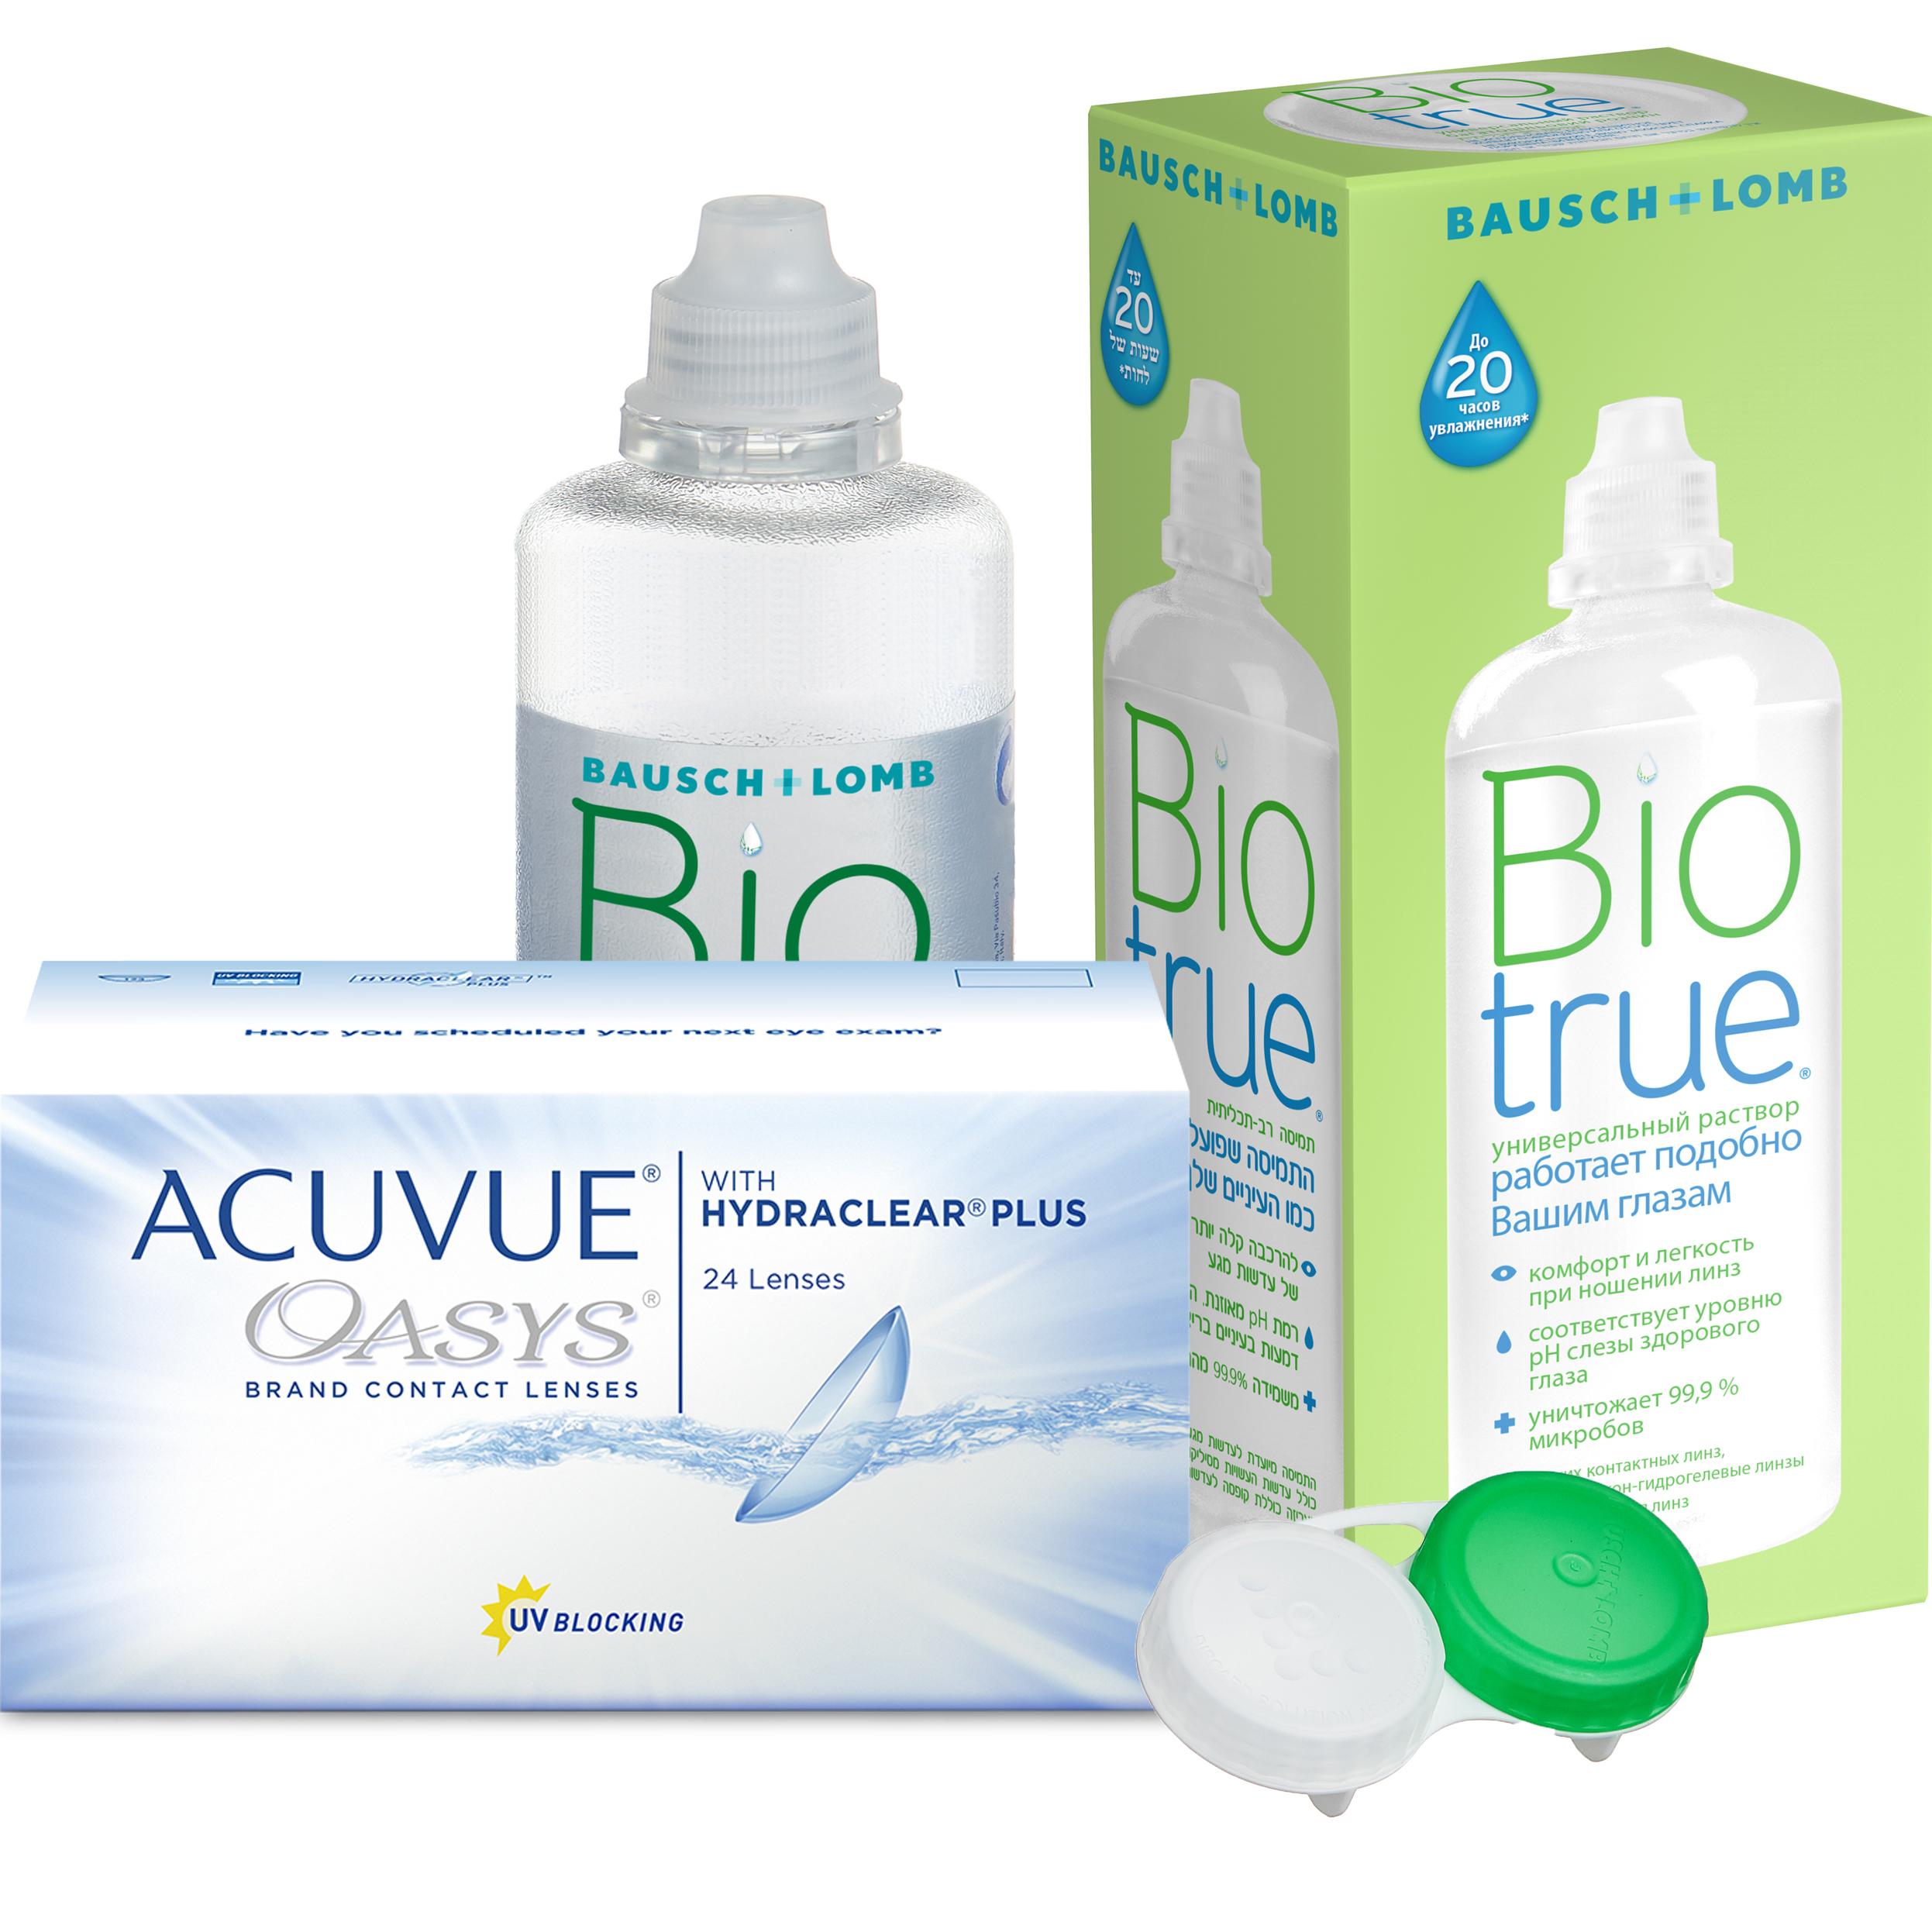 Купить Oasys with Hydraclear Plus 24 линзы + Biotrue, Контактные линзы Acuvue Oasys with Hydraclear Plus 24 линзы R 8.8 -6, 50 + Biotrue 300 мл